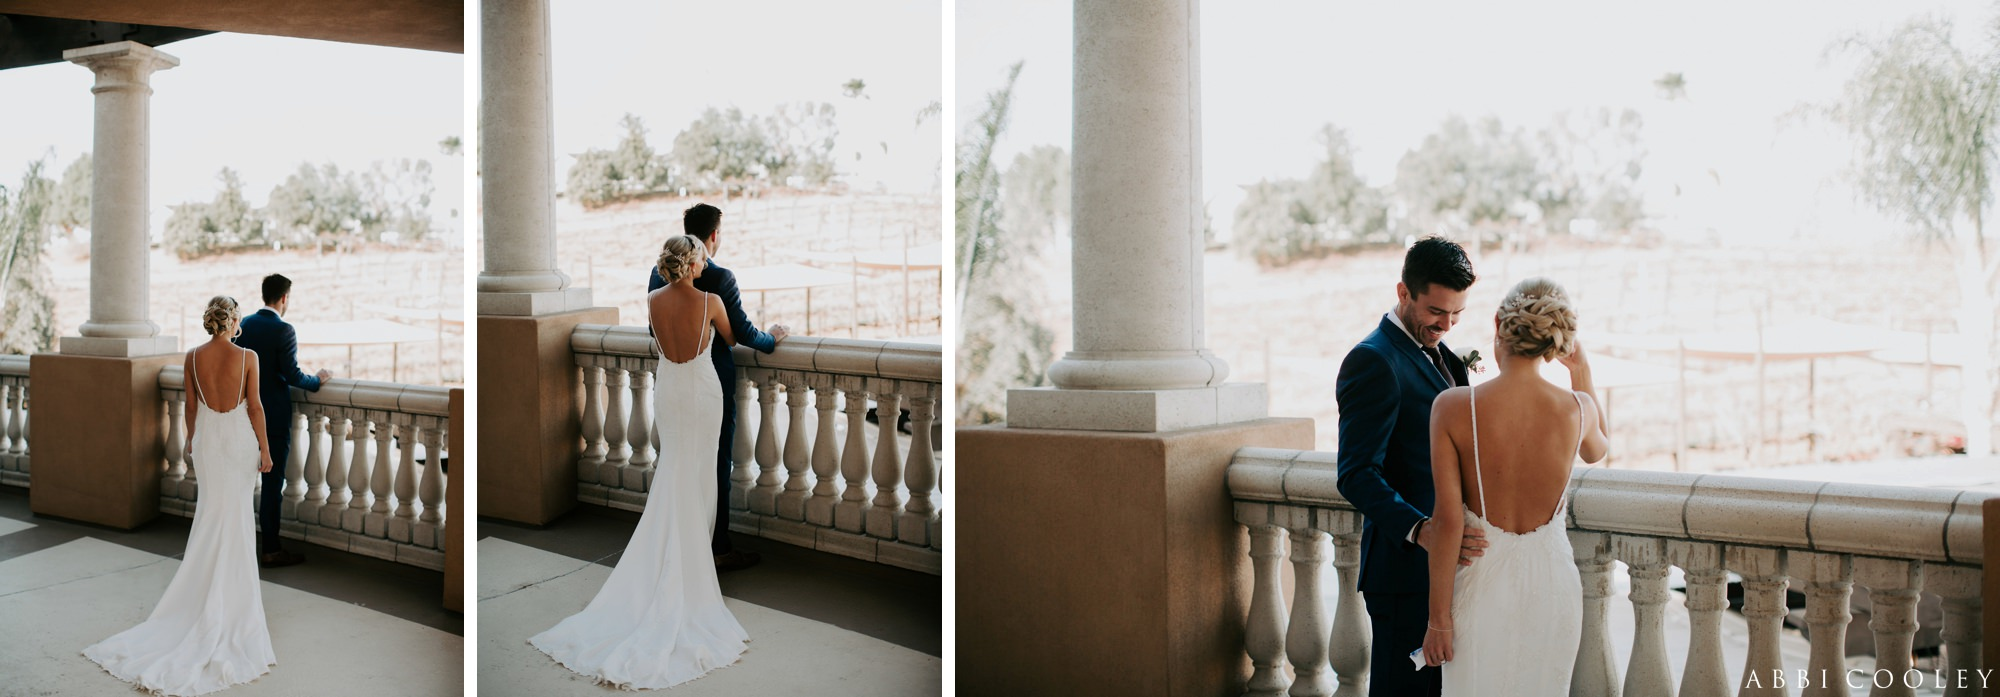 ABBI COOLEY WILSON CREEK WINERY TEMECULA WEDDING_0848